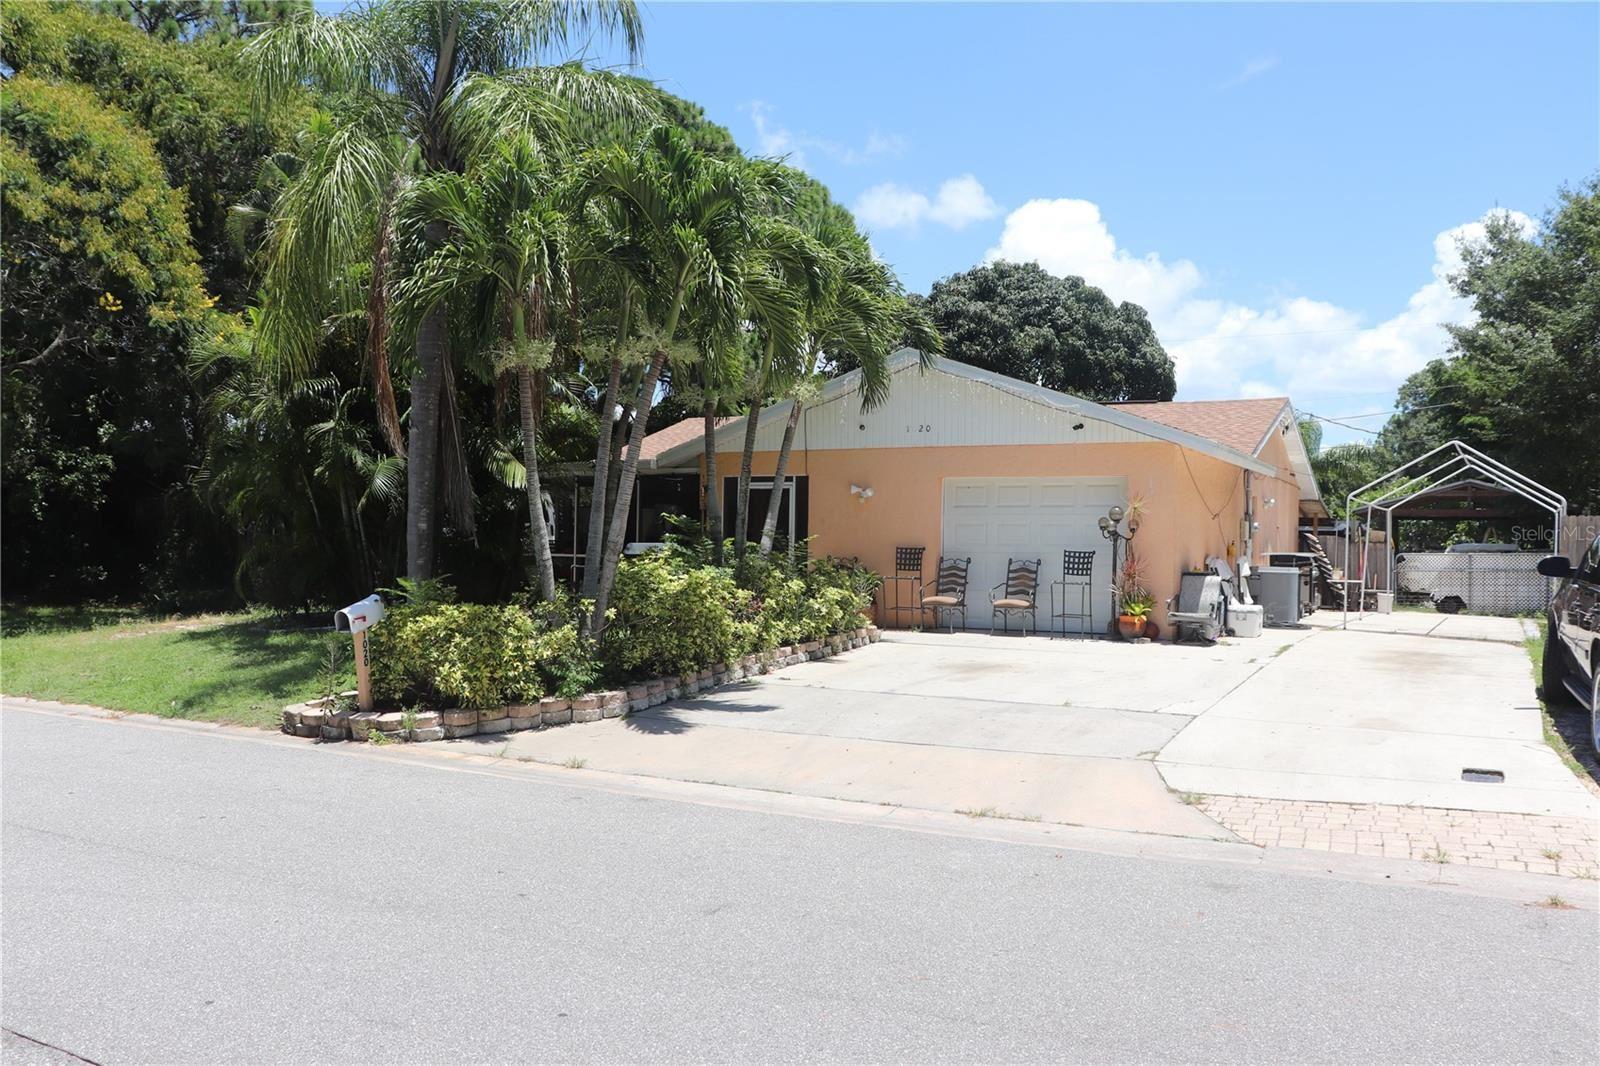 1020 N JEFFERSON AVENUE, Sarasota, FL 34237 - #: A4507491